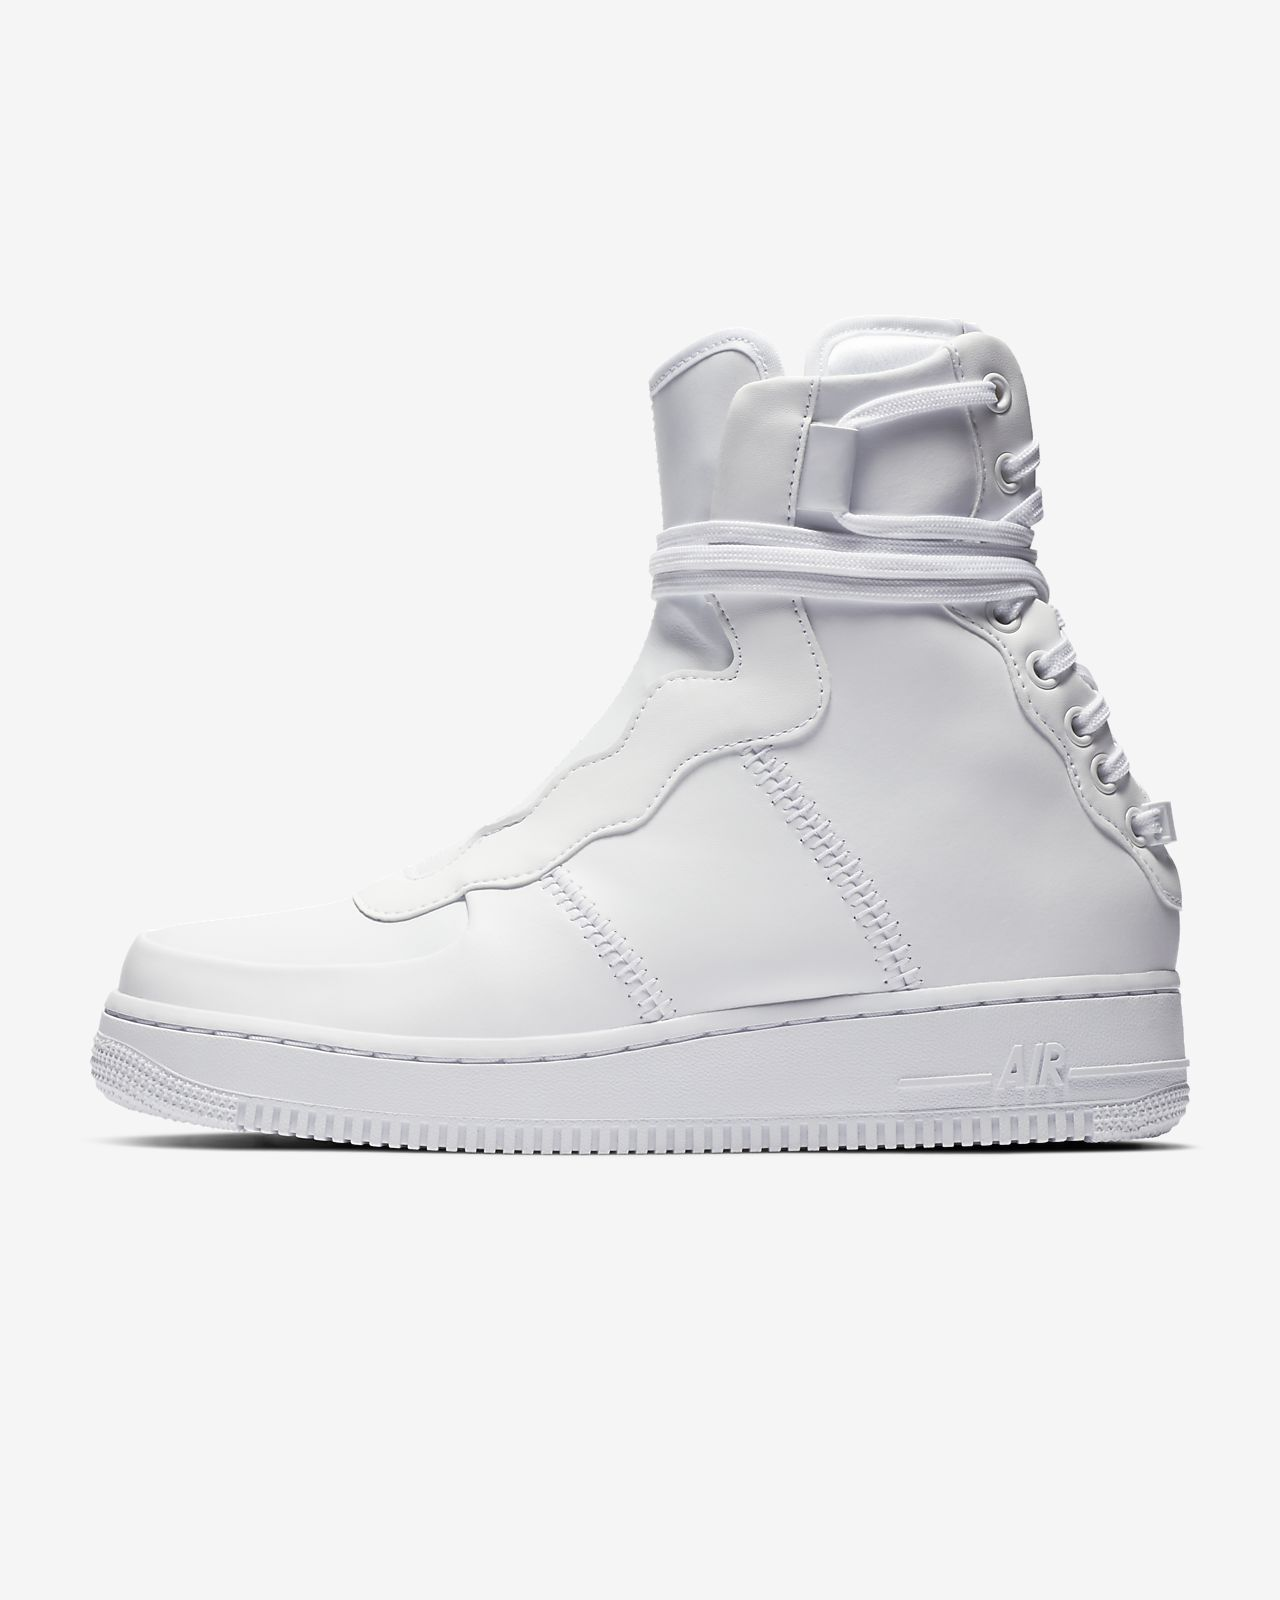 newest collection 58dfa 45b6e Nike AF1 Rebel XX 女子运动鞋